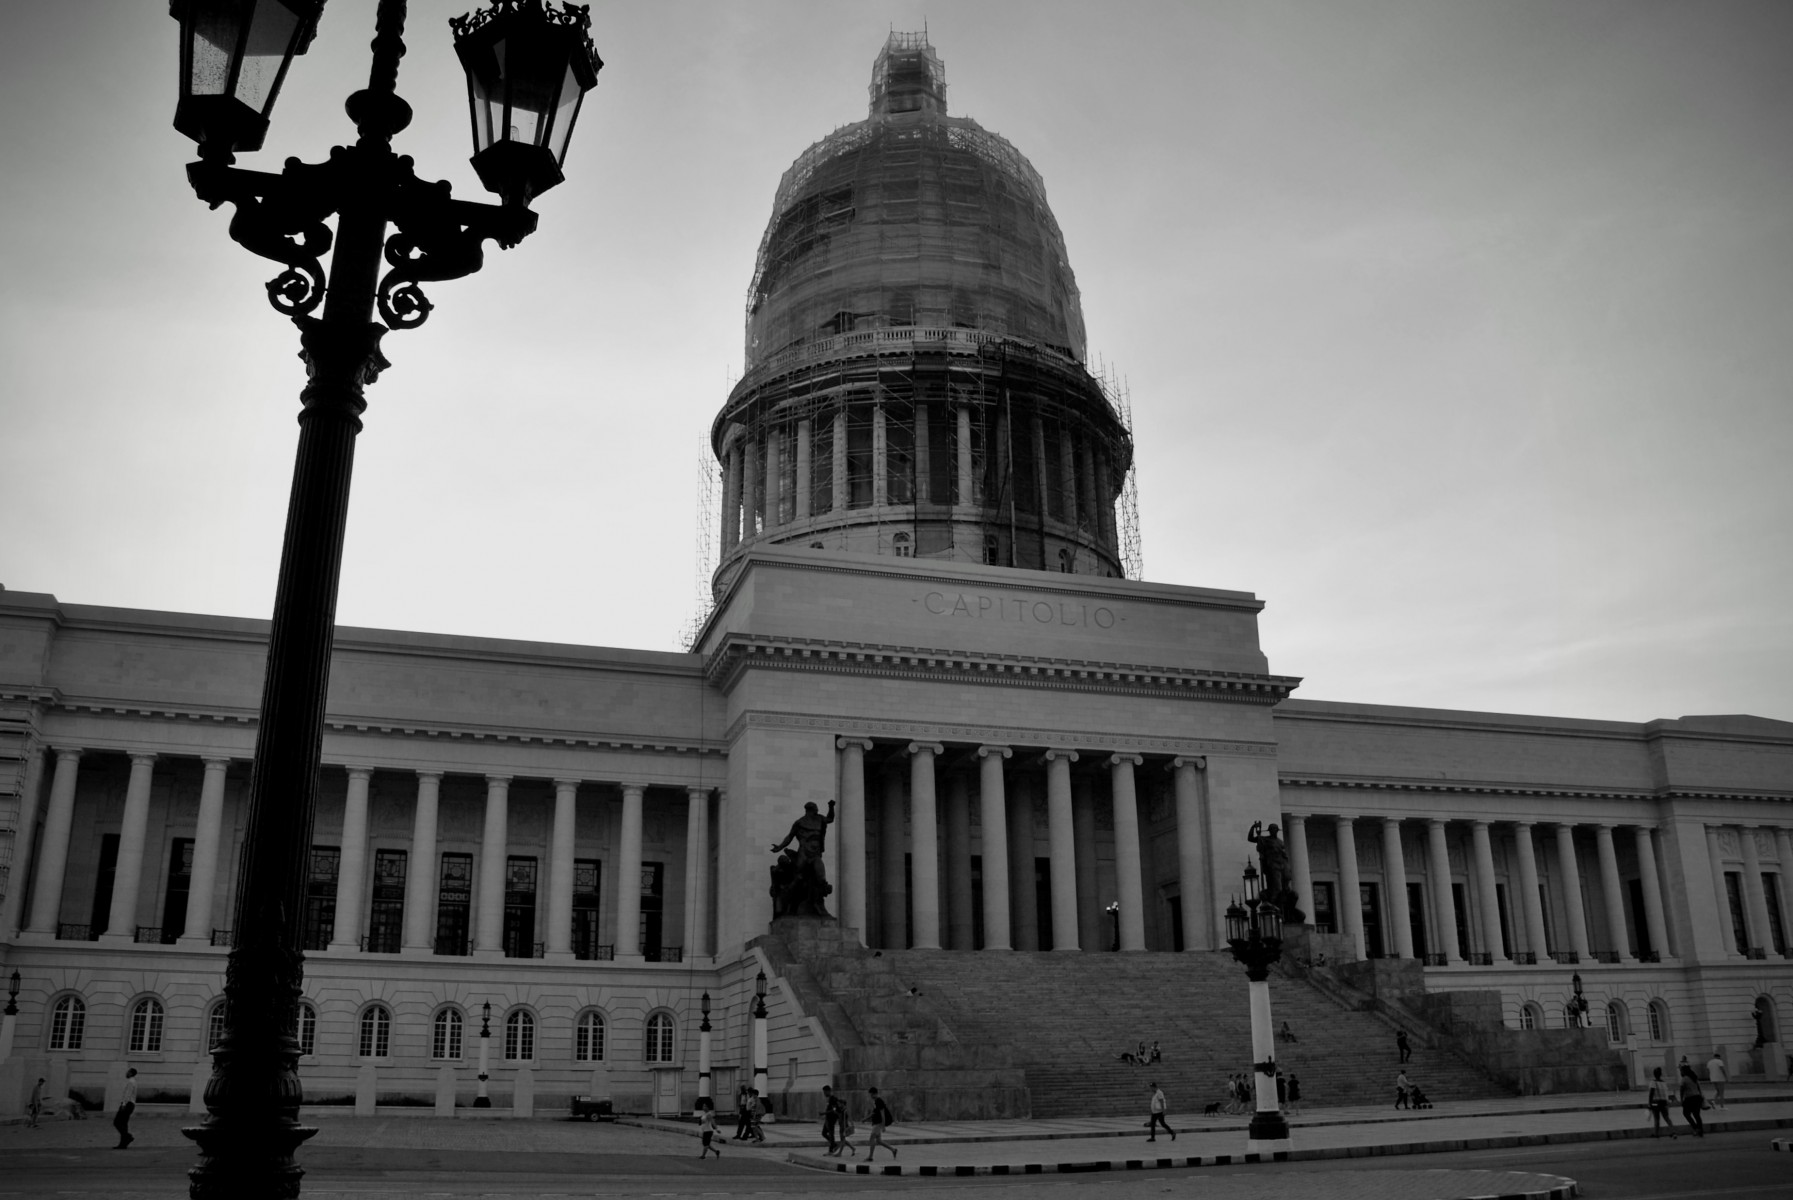 La Habana - El Capitolio Nacional